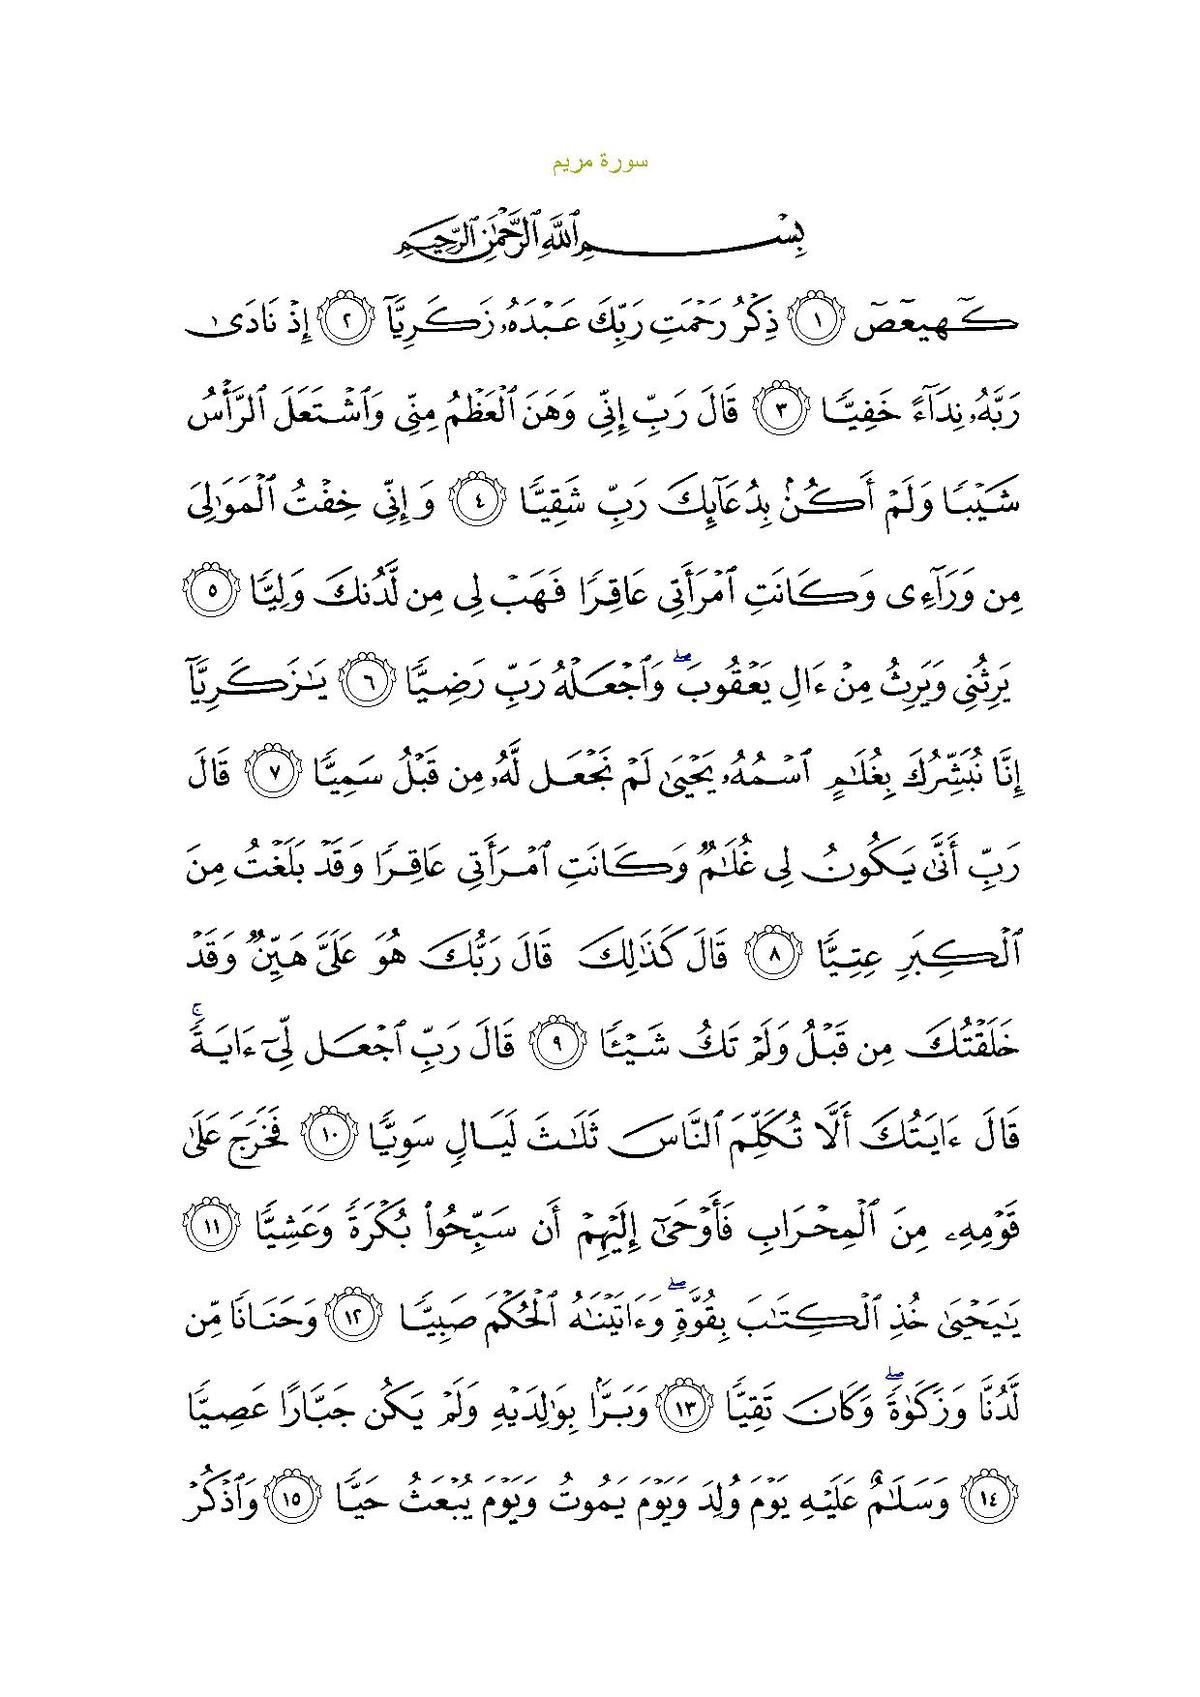 Surat Maryam Wikipèdia Bahsa Acèh ènsiklopèdia Bibeuëh